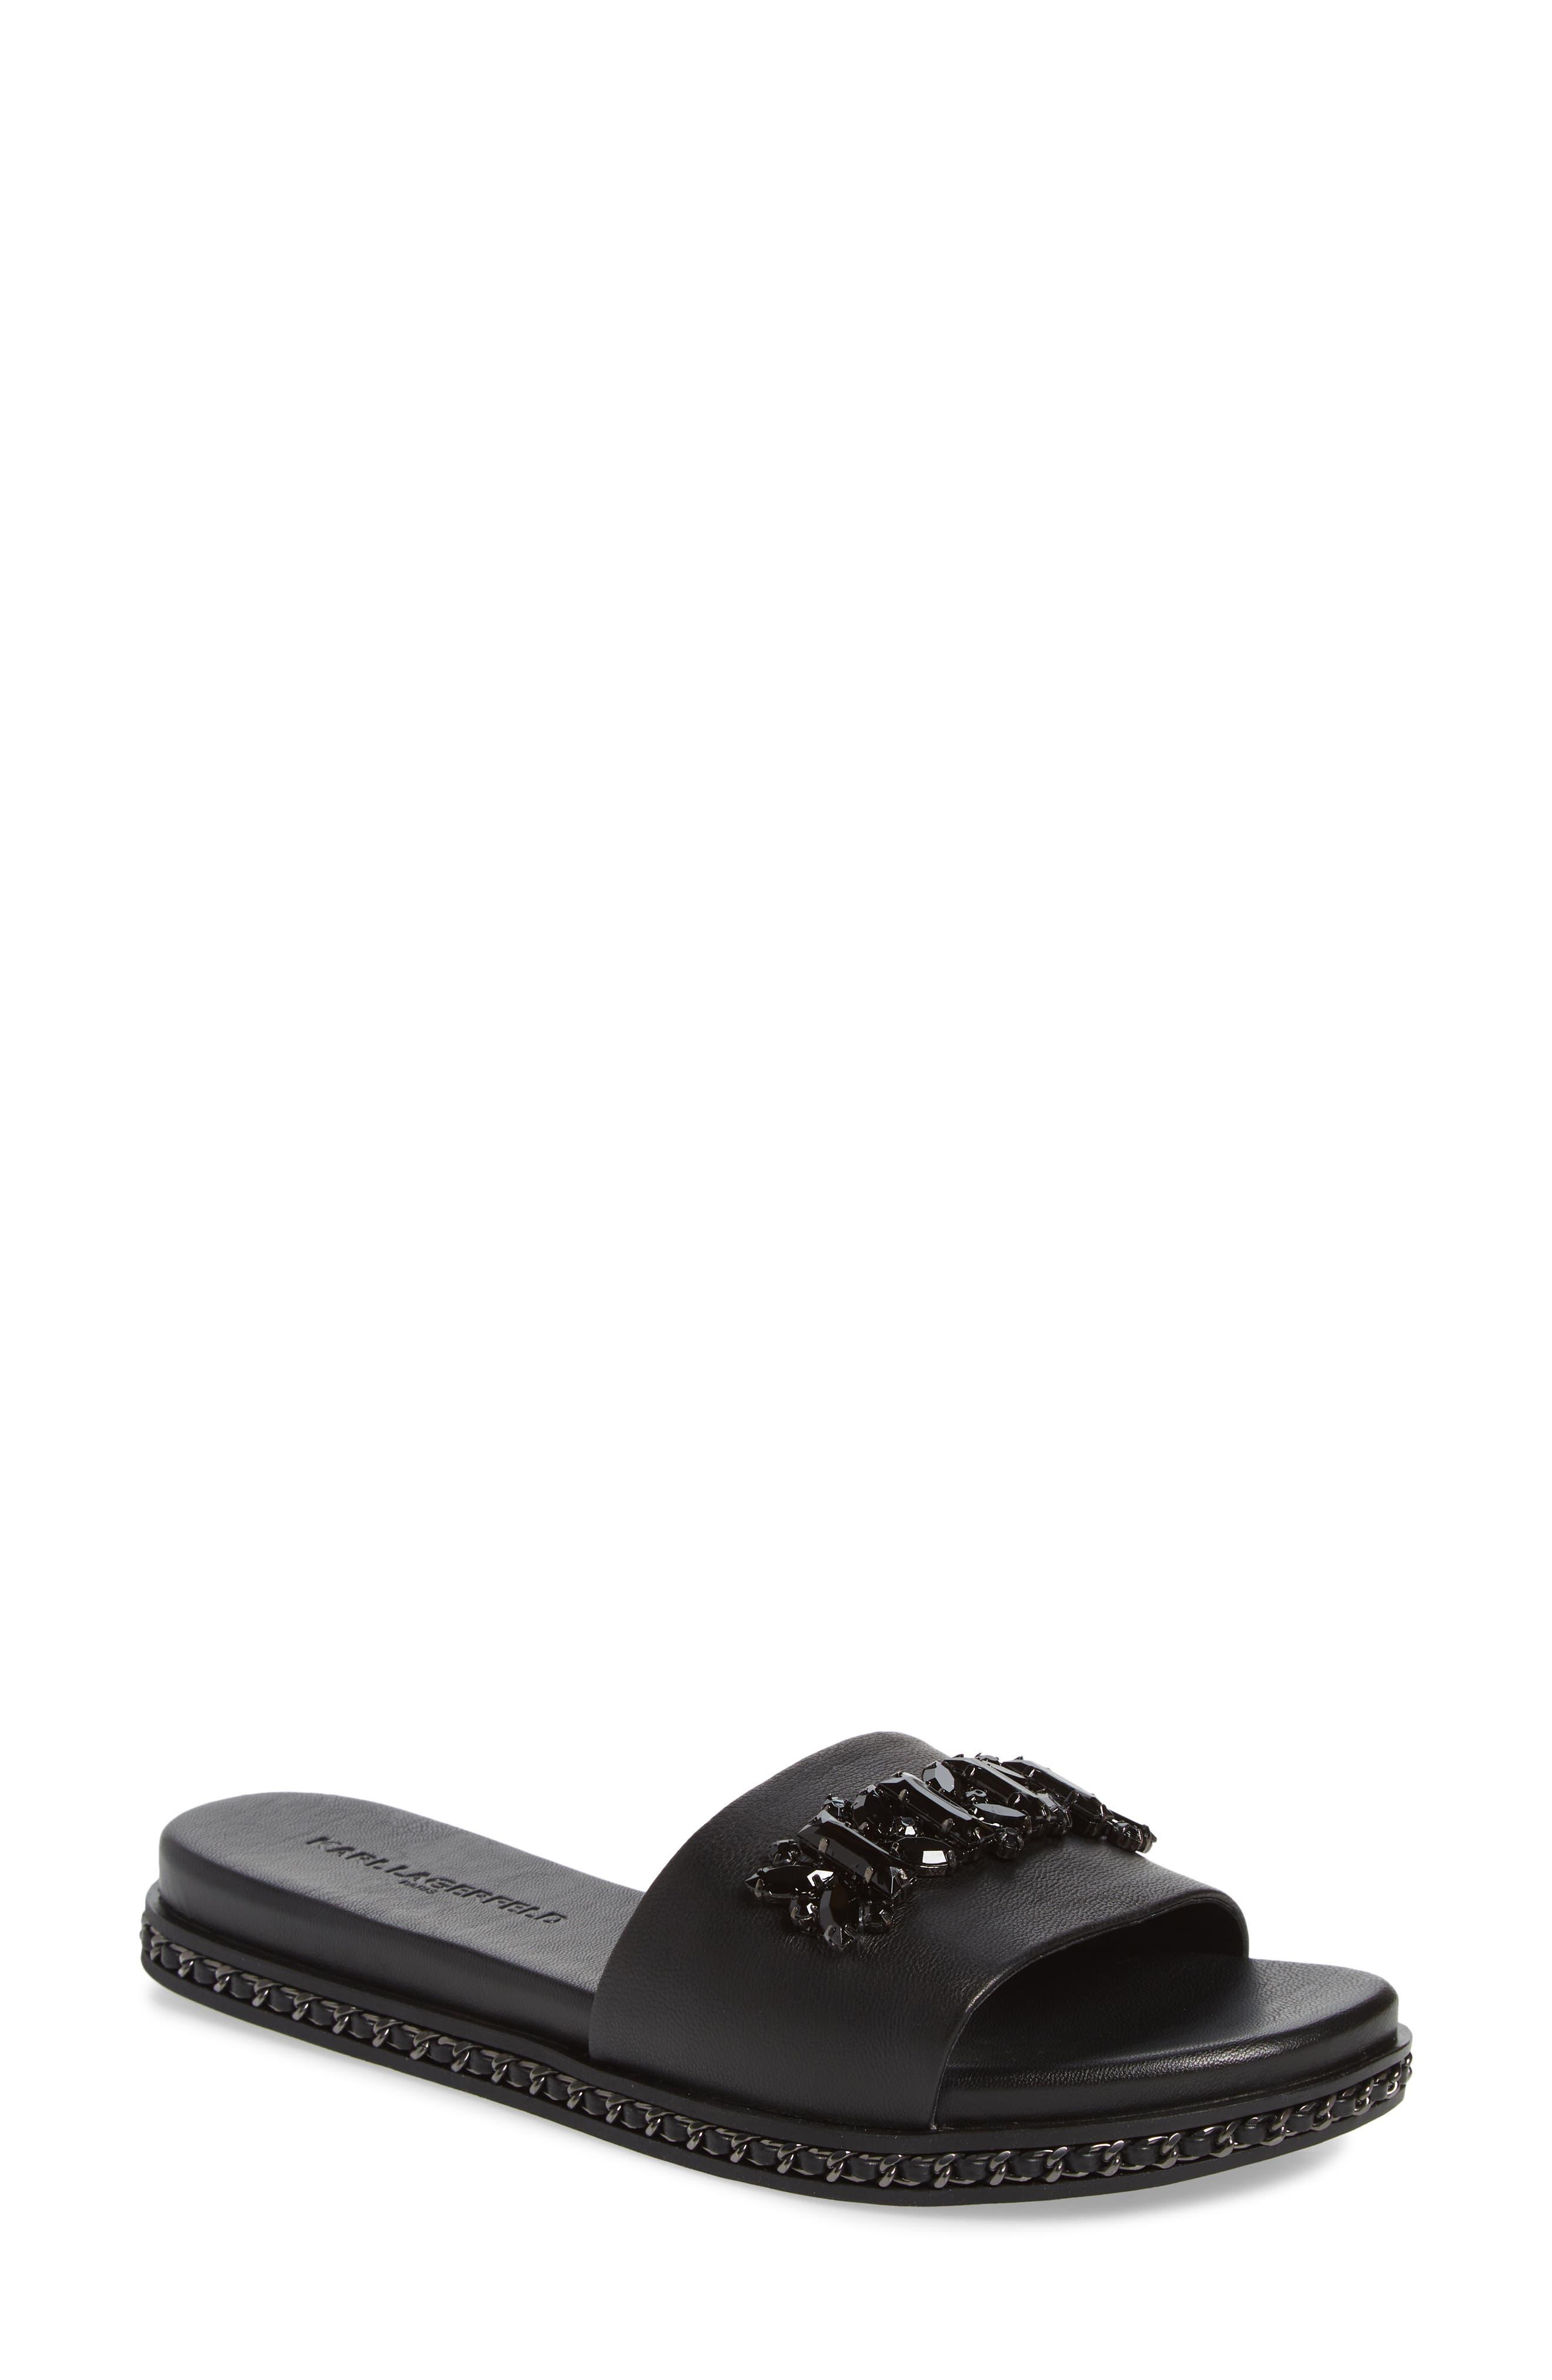 Bijou Slide Sandal